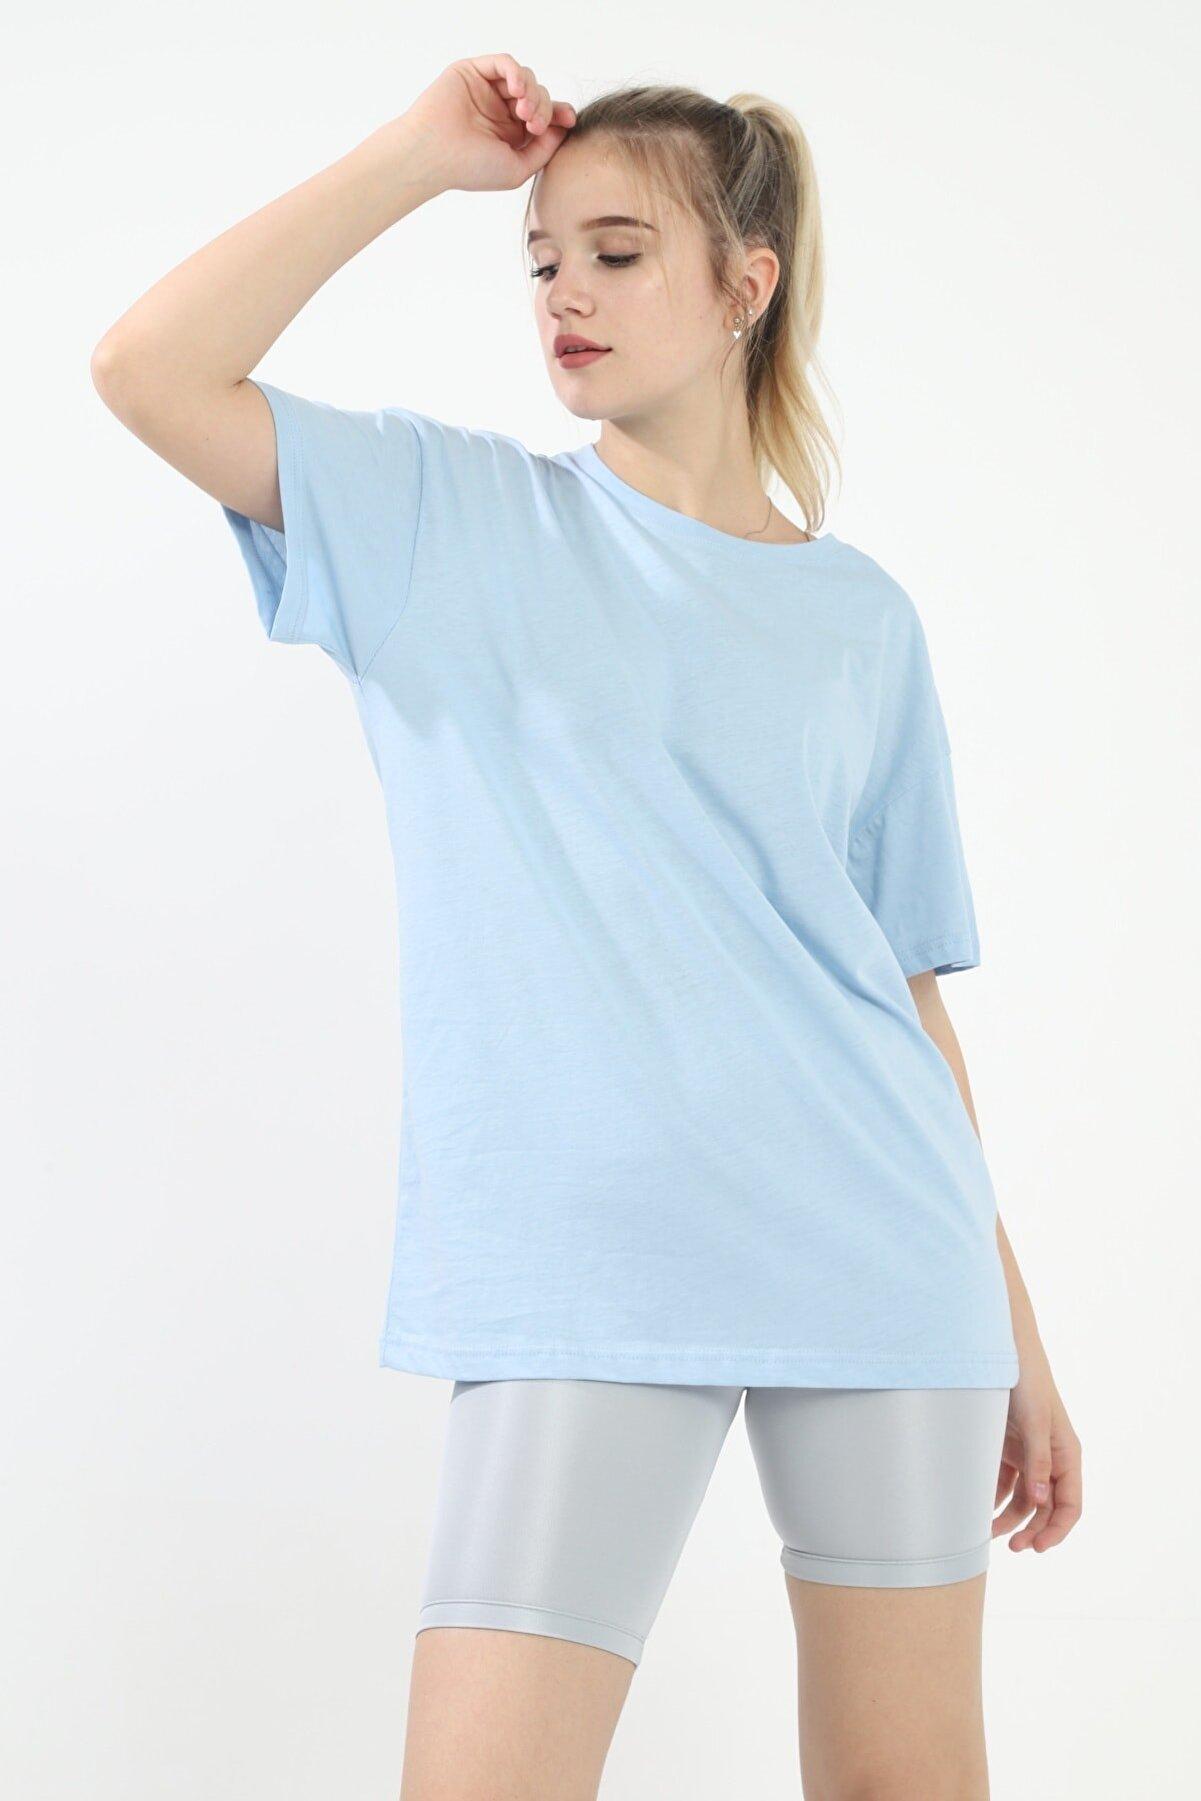 Grenj Fashion Bebe Mavi %100 Pamuk Bisiklet Yaka Oversize Örme Tshirt